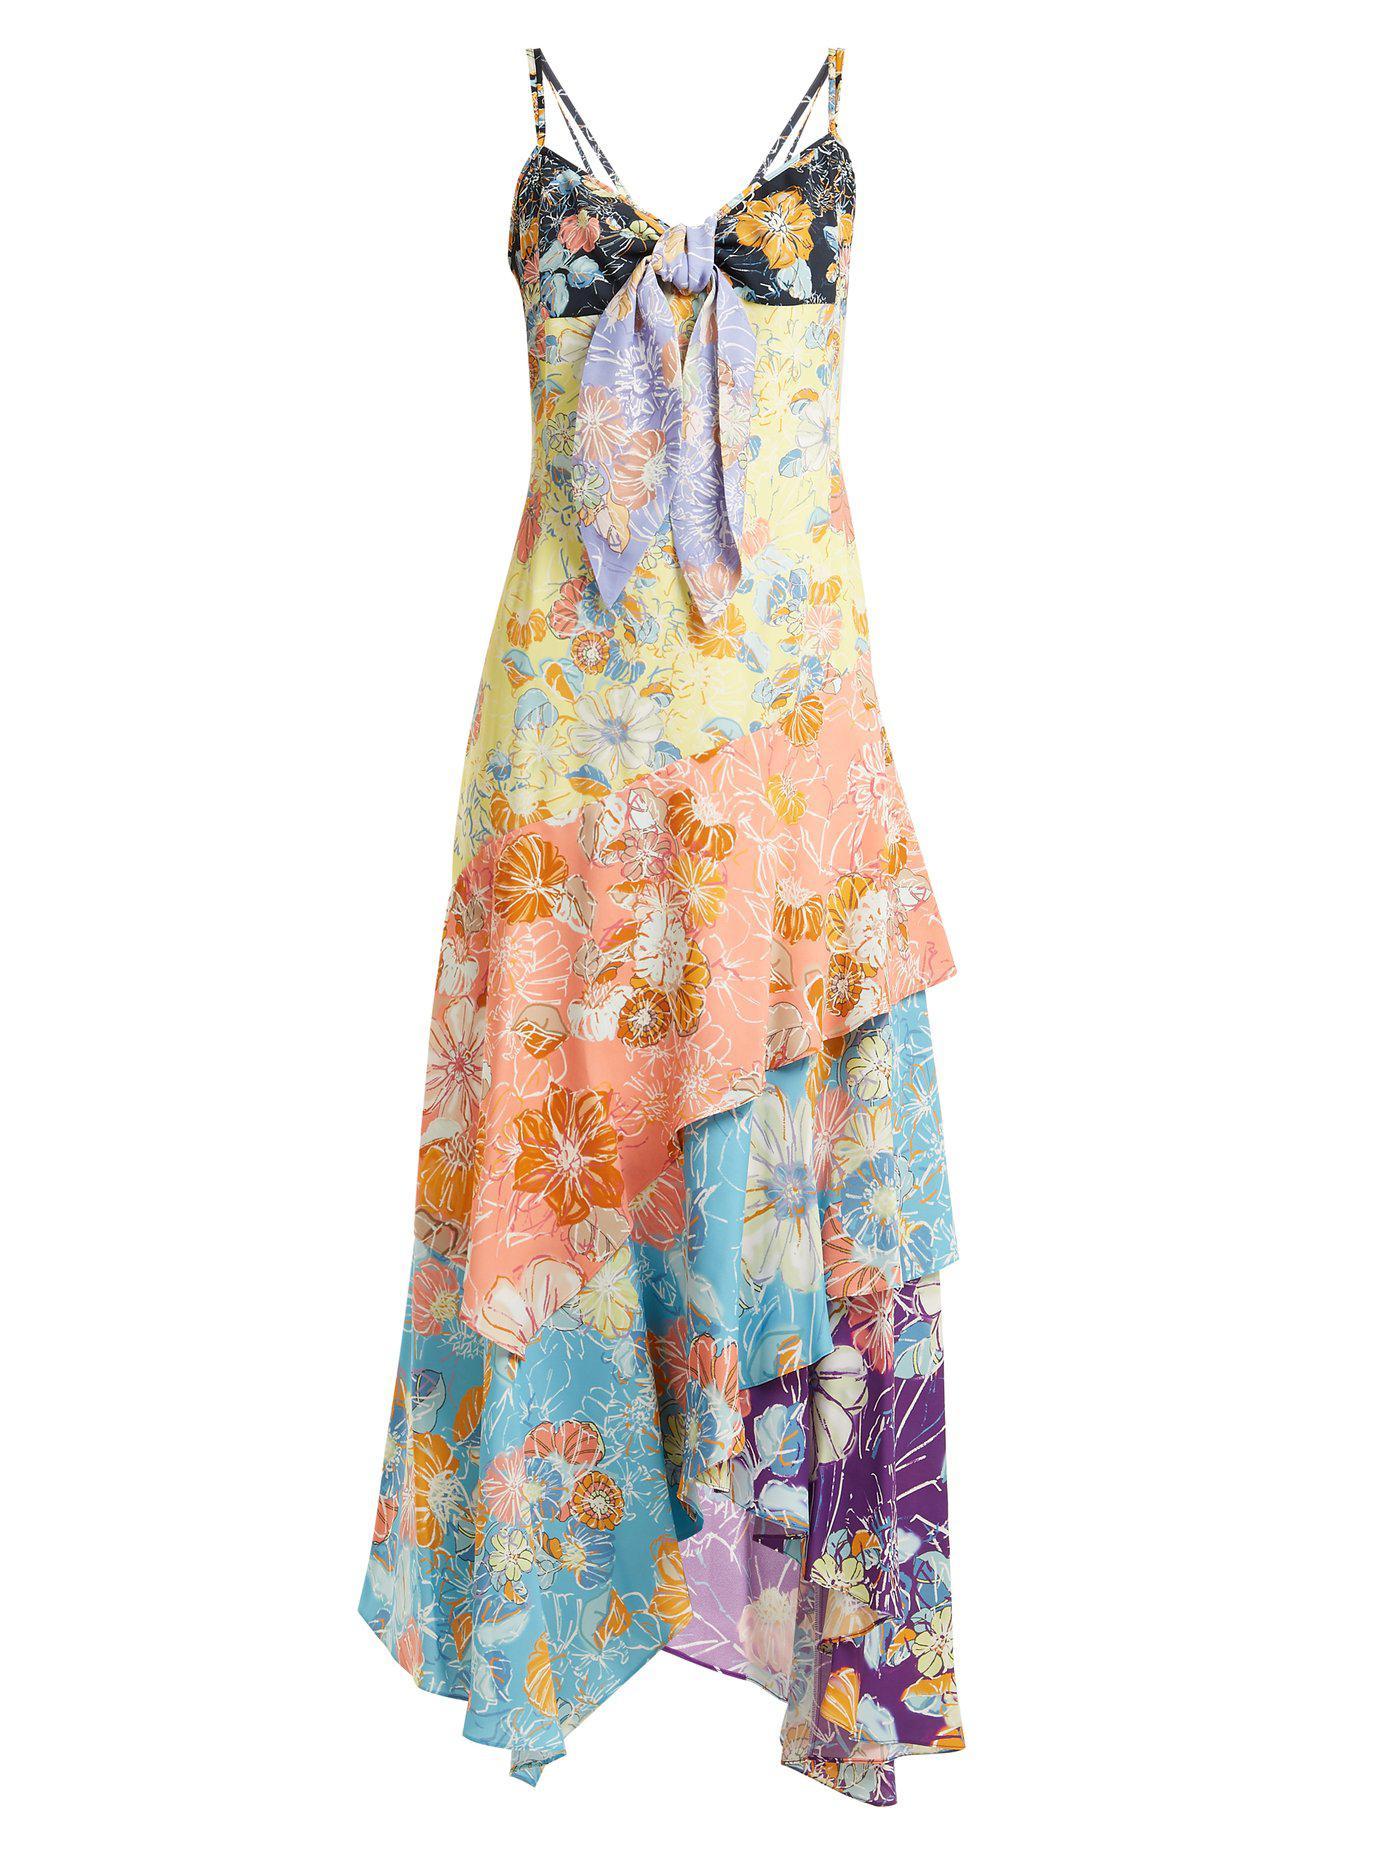 Peter Pilotto. Women's Floral Print Multi-panel Asymmetric Dress